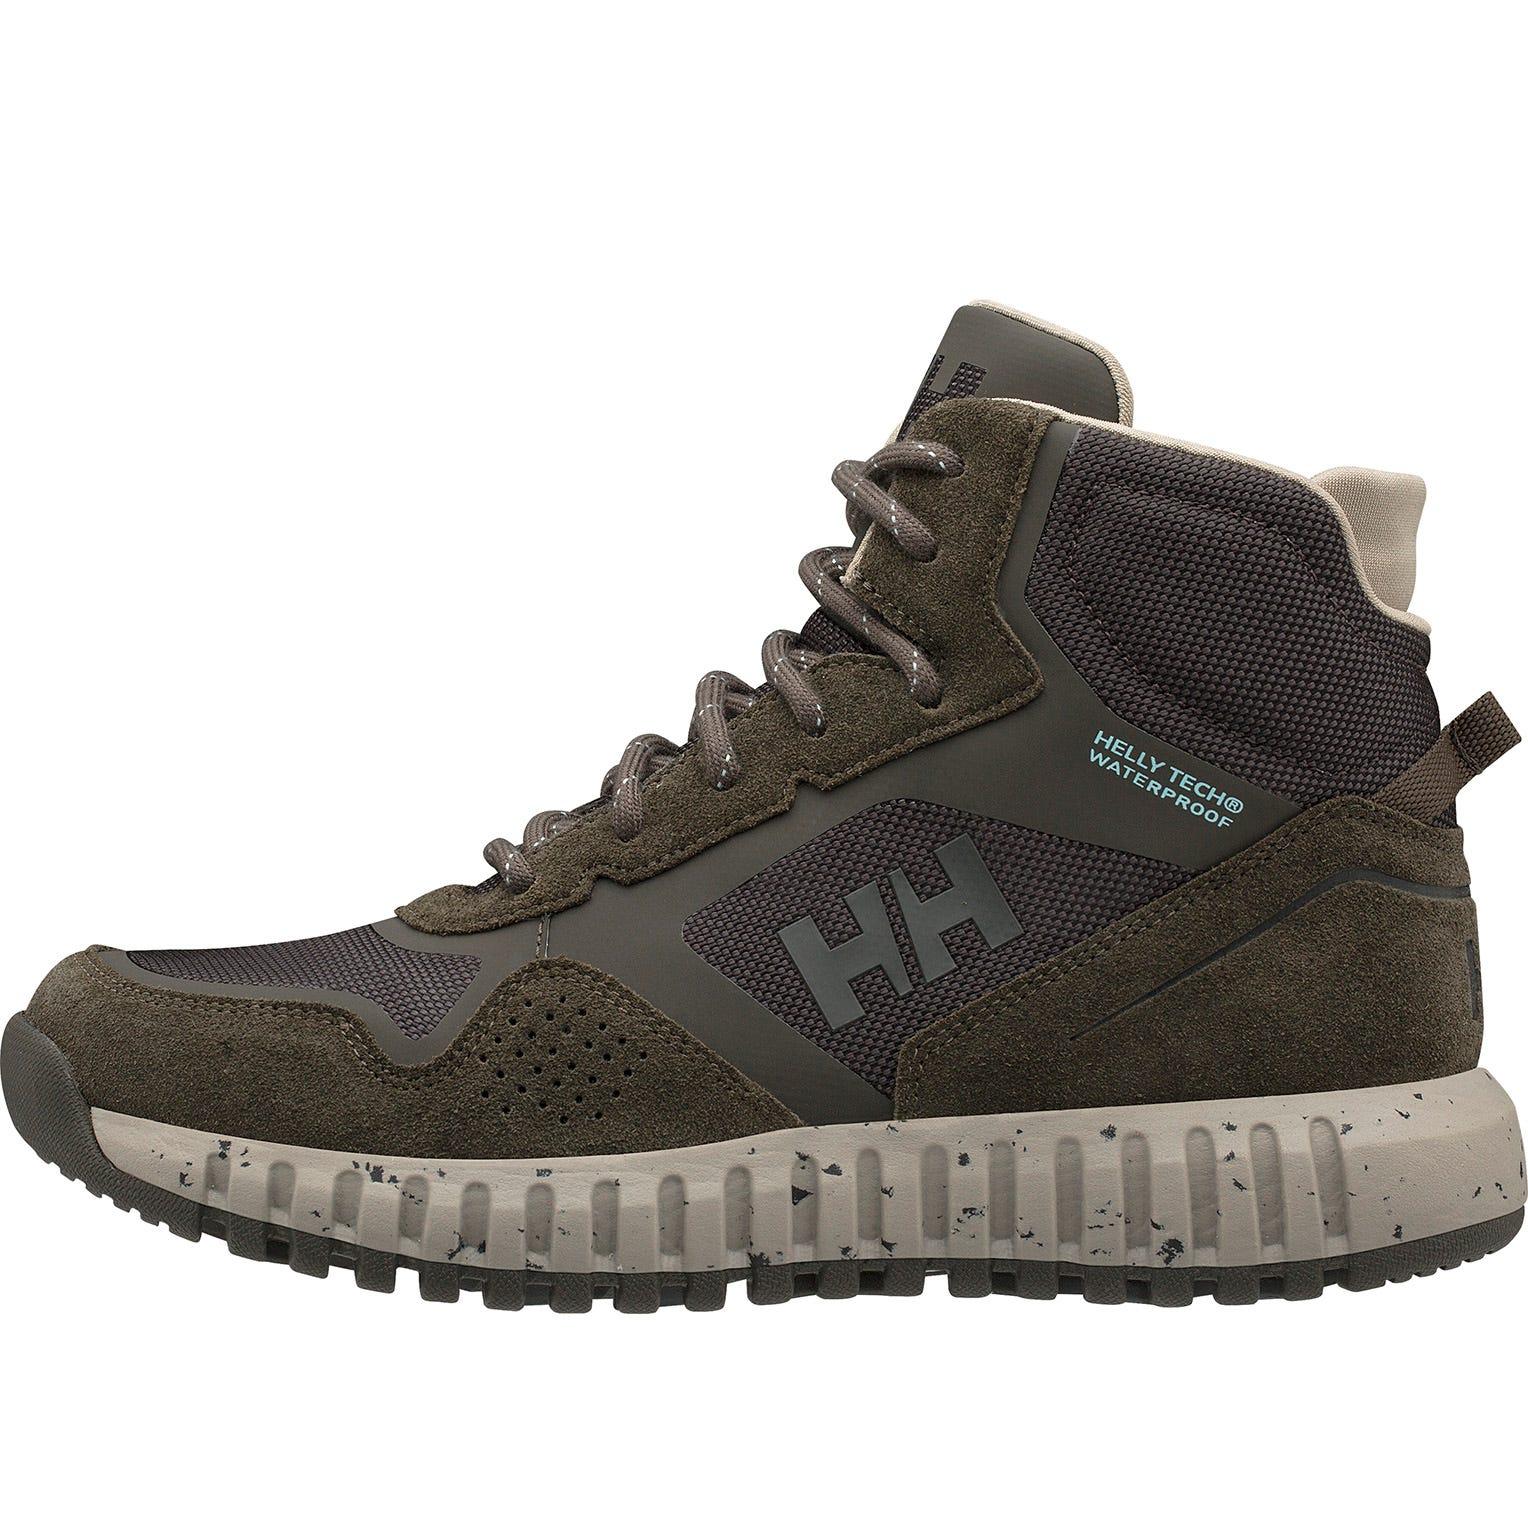 Helly Hansen W Monashee Ullr Ht Womens Hiking Boot Brown 38.7/7.5